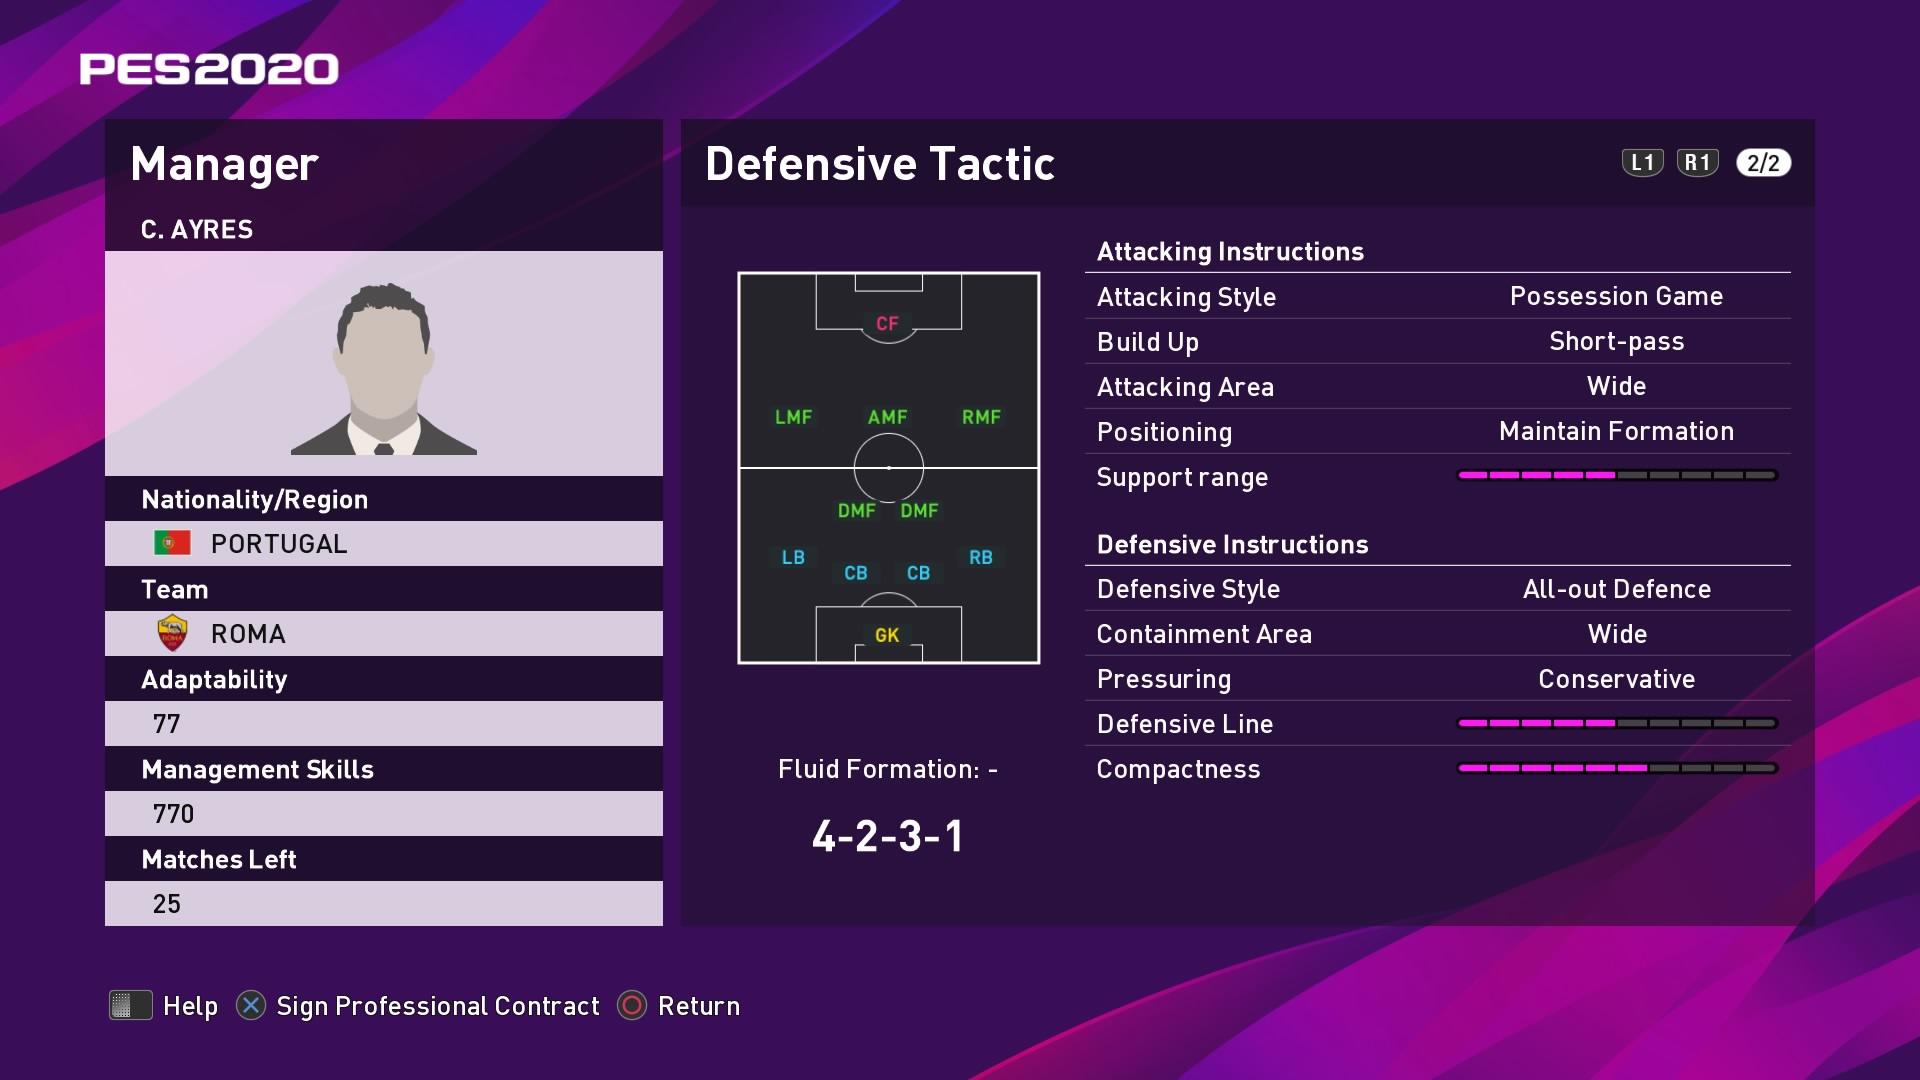 C. Ayres (Paulo Fonseca) Defensive Tactic in PES 2020 myClub